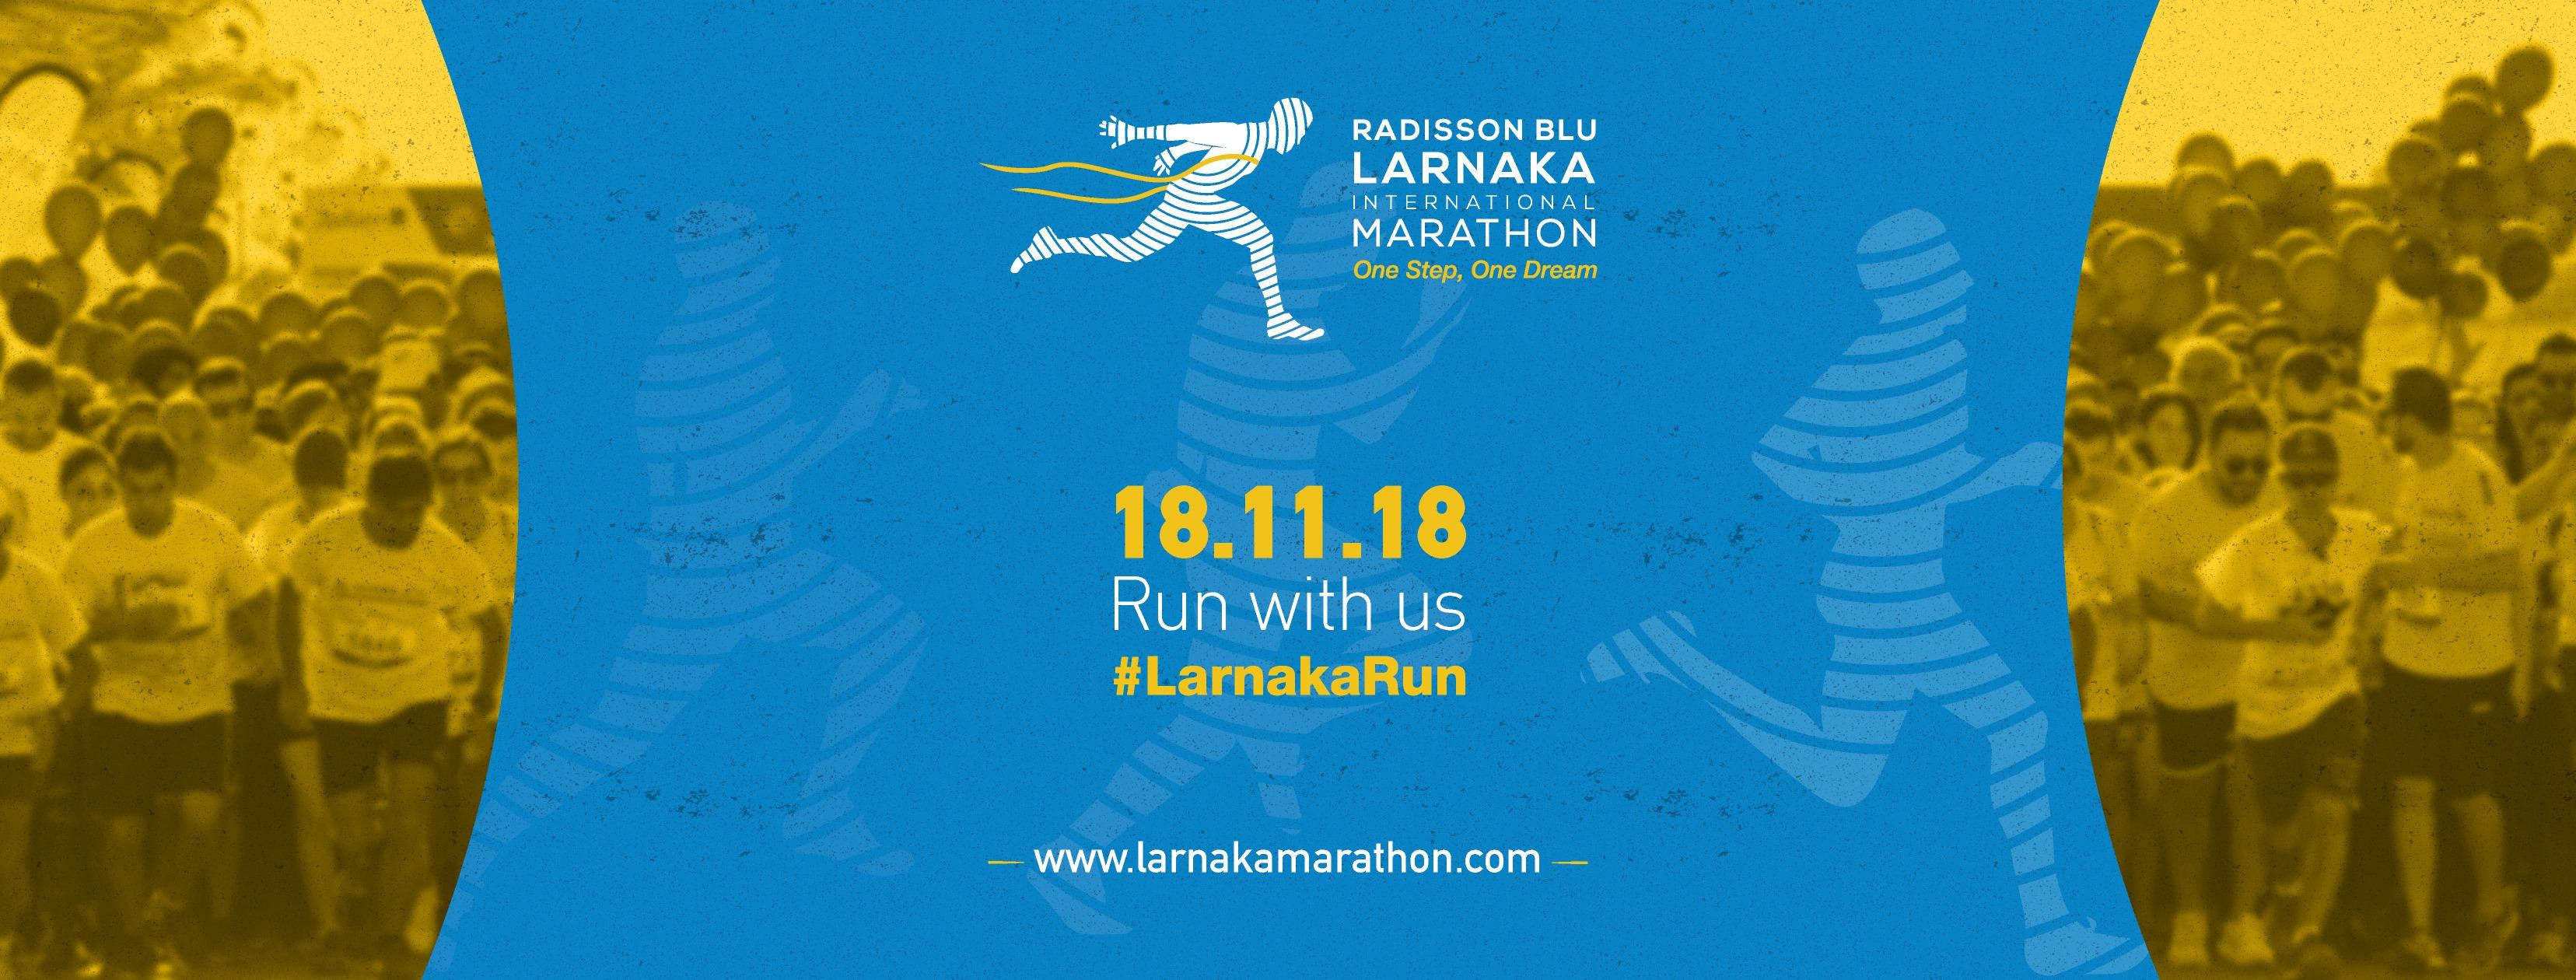 Radisson Blu Larnaka International Marathon - Race Connections